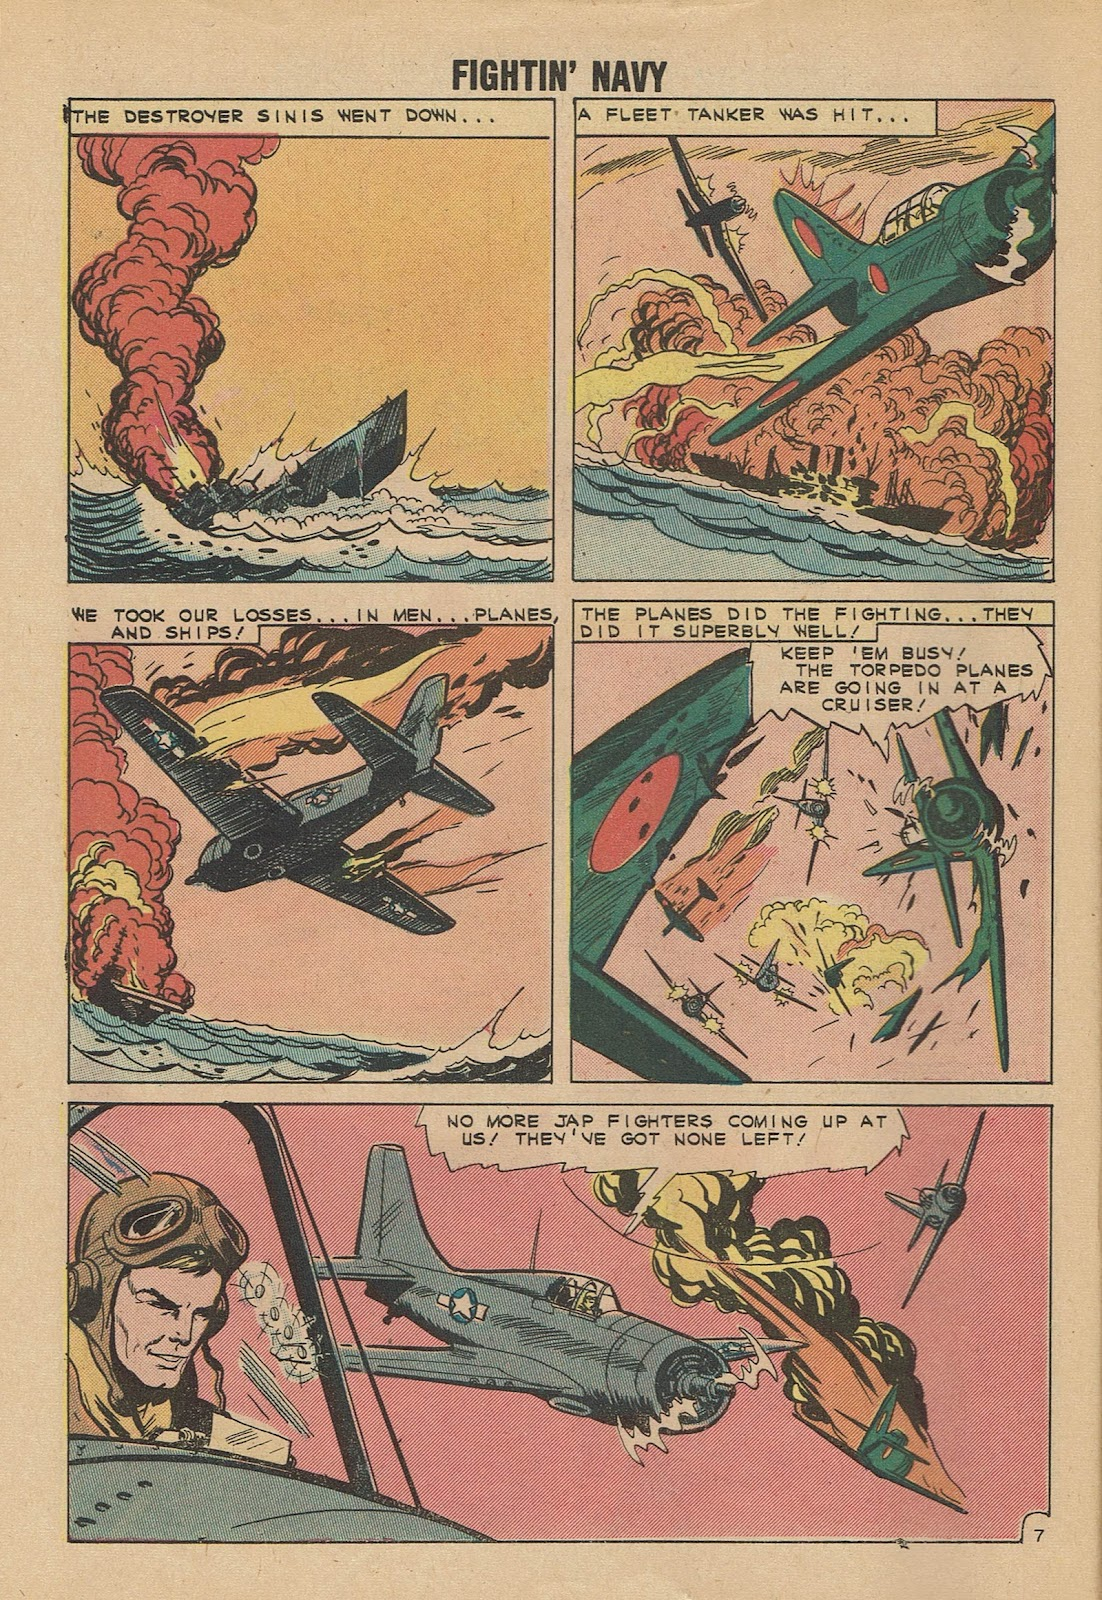 Read online Fightin' Navy comic -  Issue #101 - 10